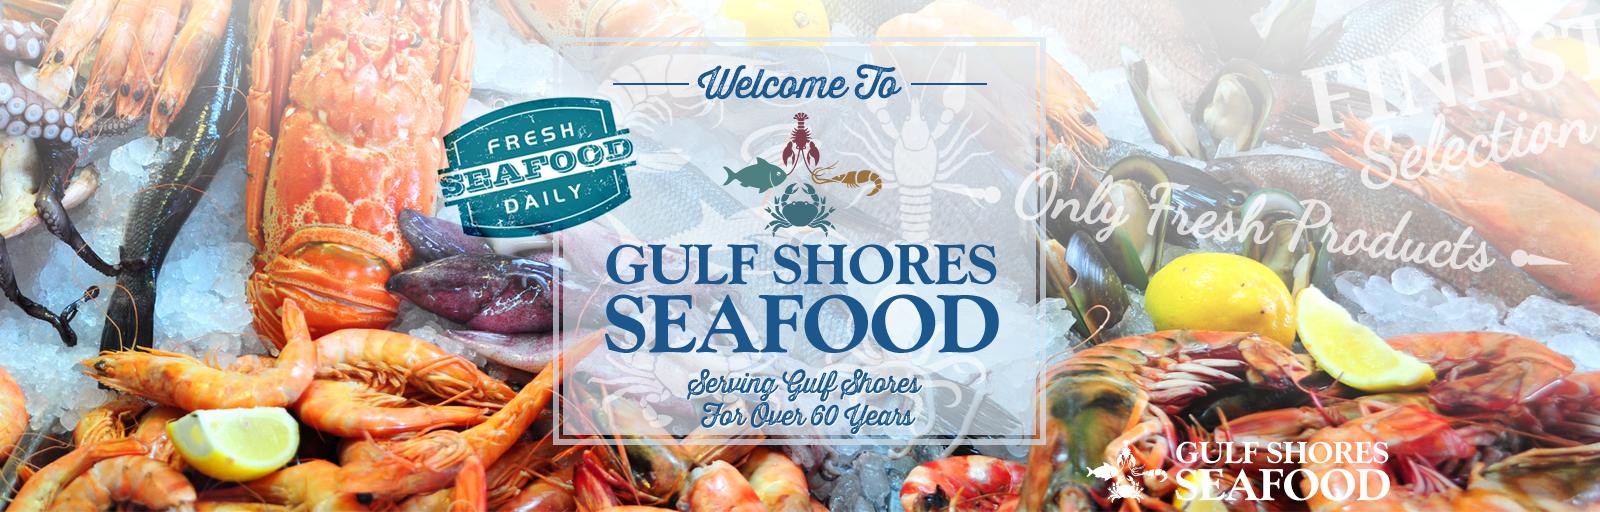 seafood baldwin county al gulf shores seafood rh gulfshoresseafood com seafood buffet in gulf shores alabama seafood buffet in gulf shores or orange beach